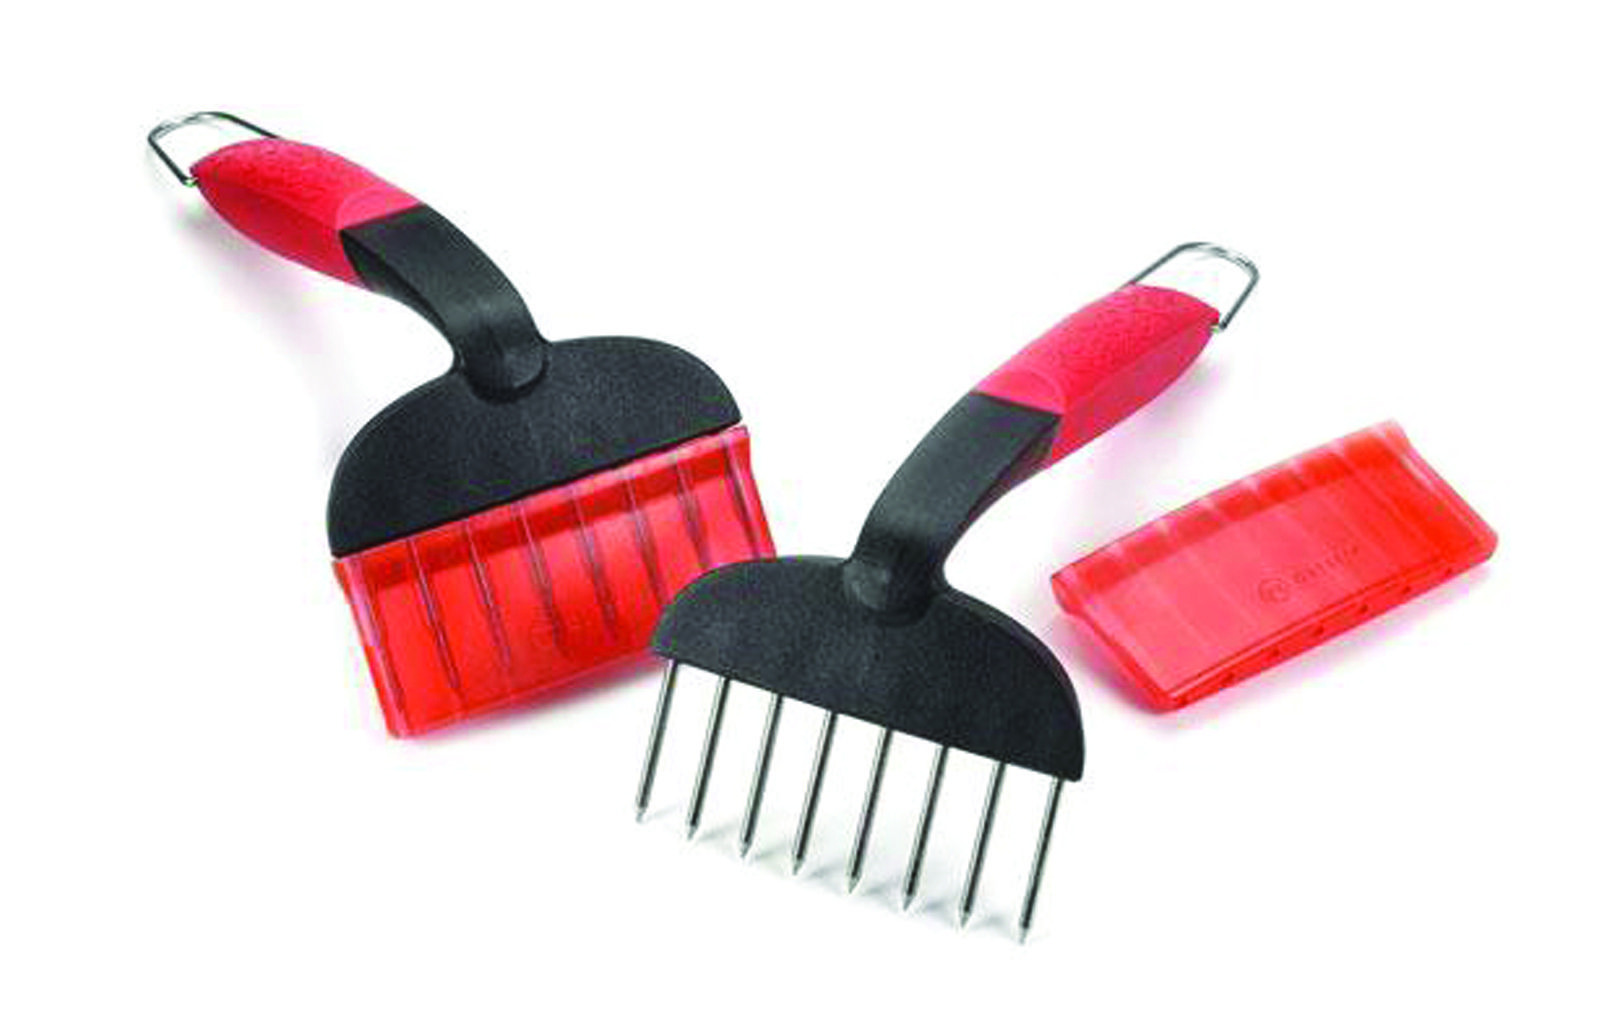 Red Norpro 949 2-Piece Meat Shredders